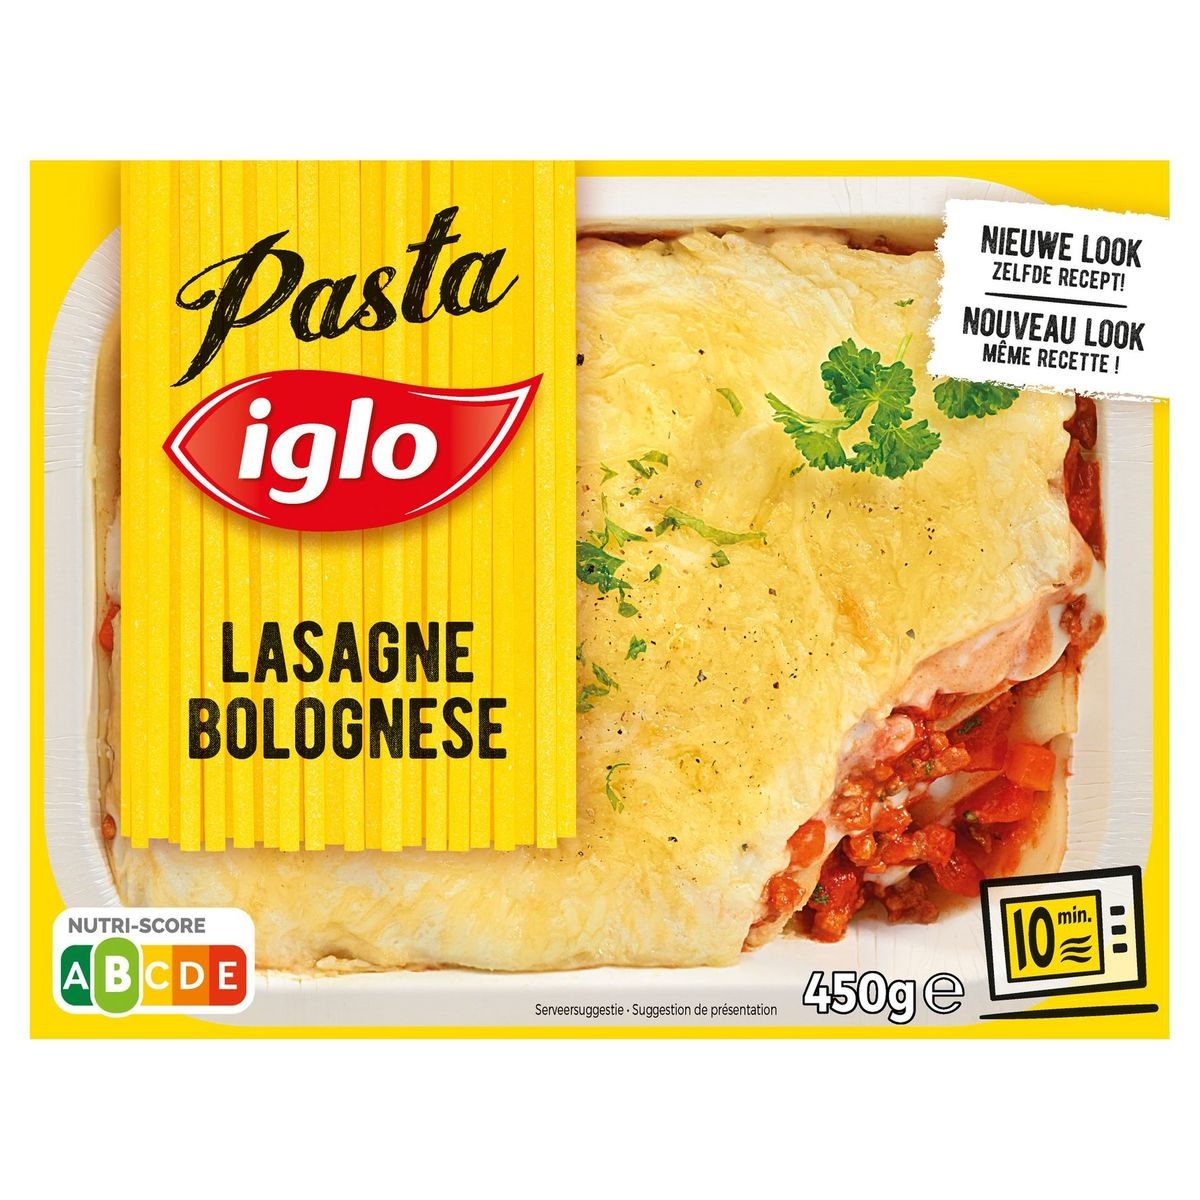 Iglo Lasagne Bolognese 450g